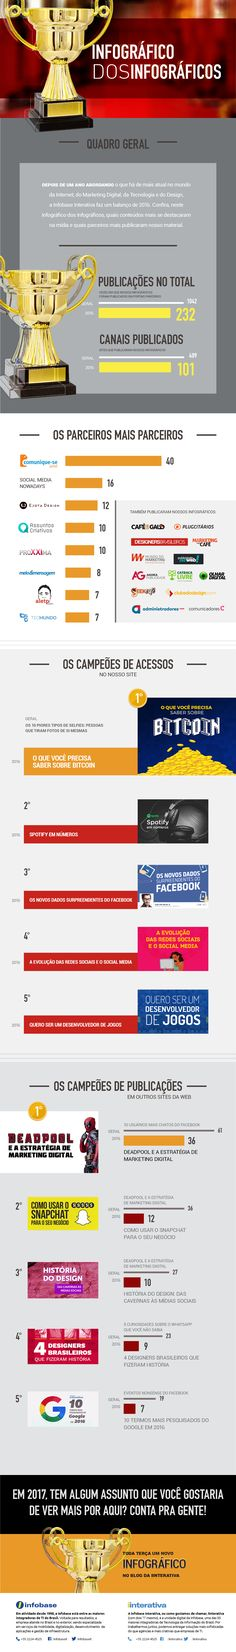 Infográfico dos Infográficos 2016